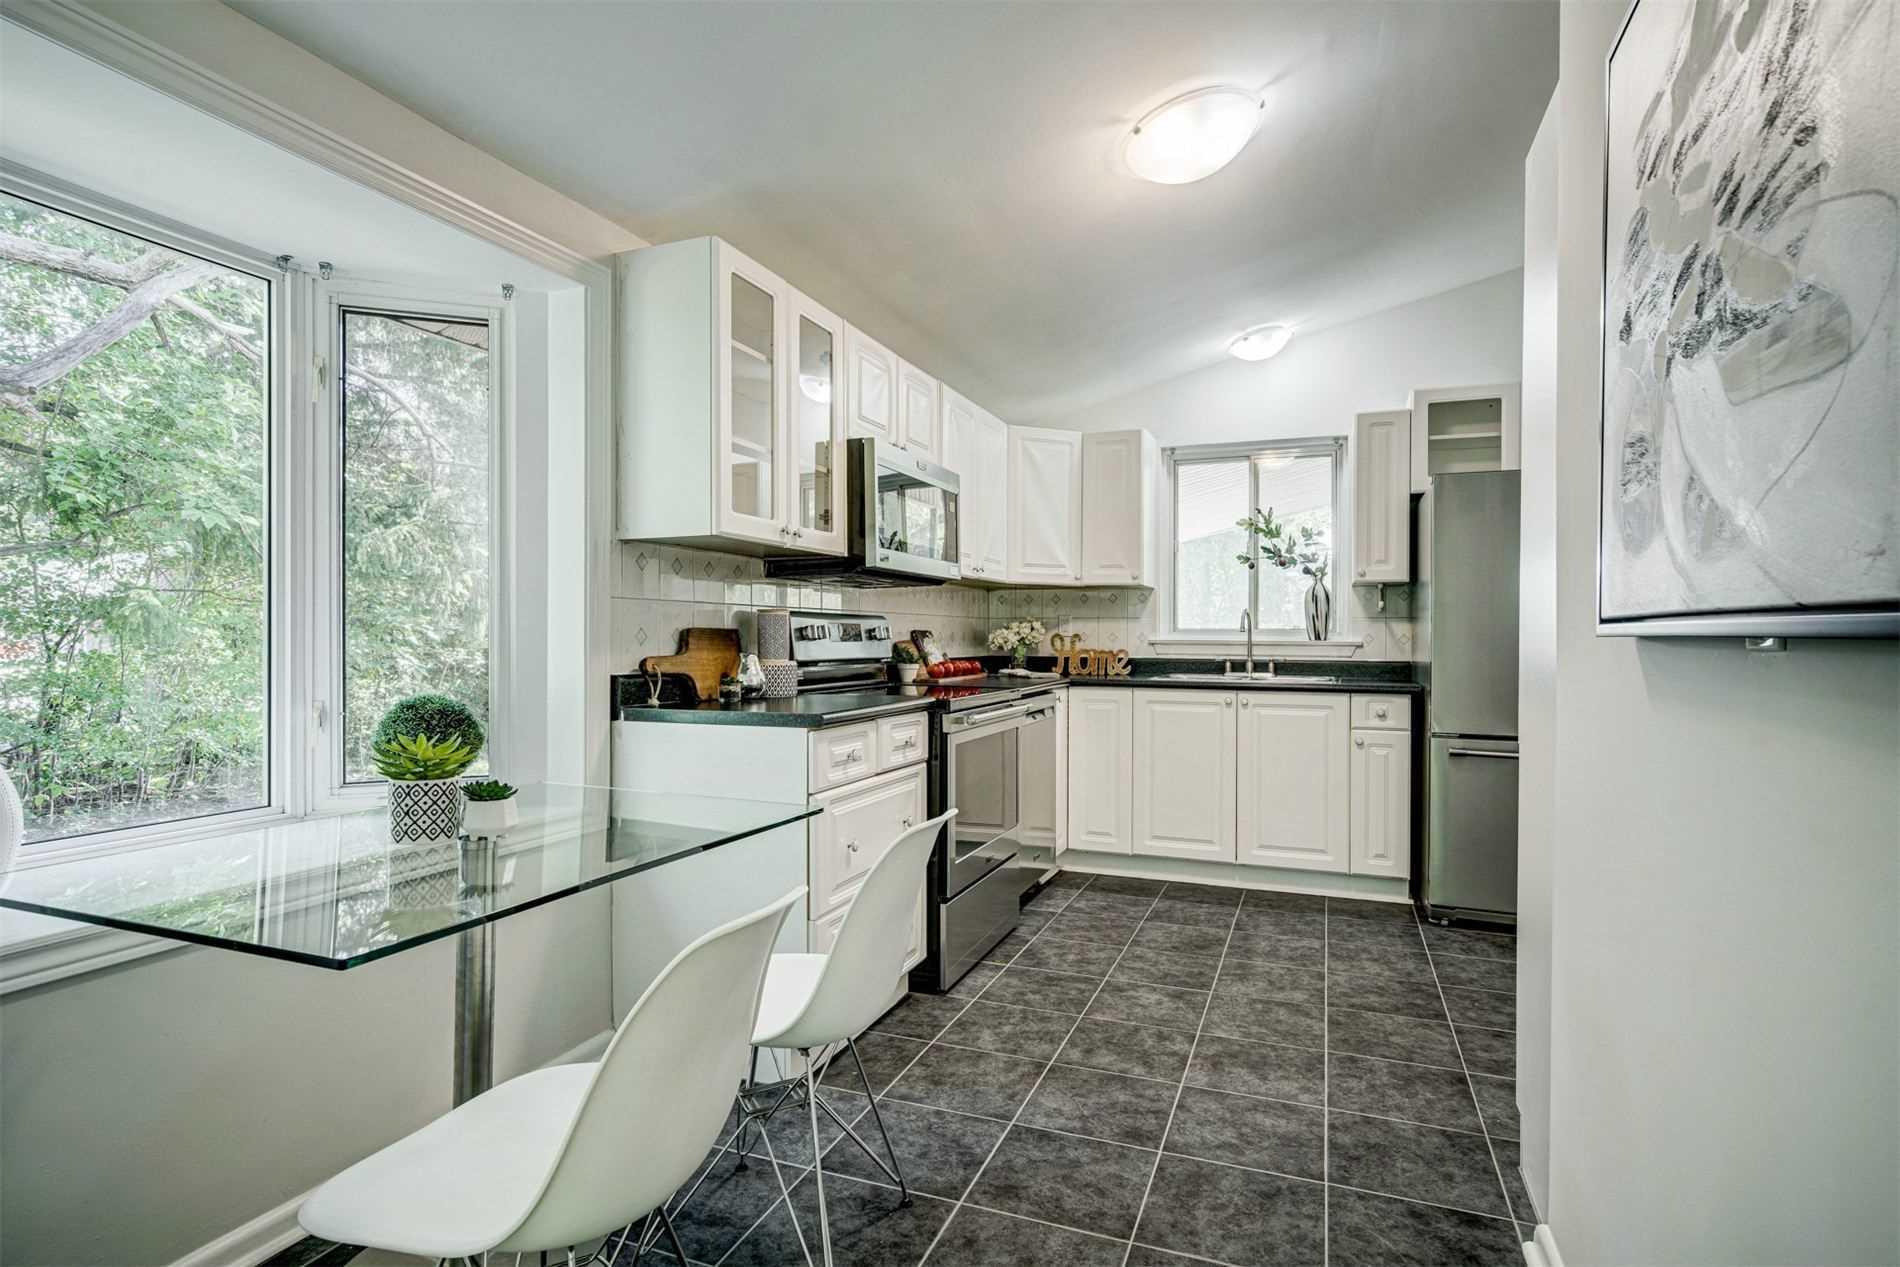 140 Verobeach Blvd - Humbermede Detached for sale, 3 Bedrooms (W5385046) - #11